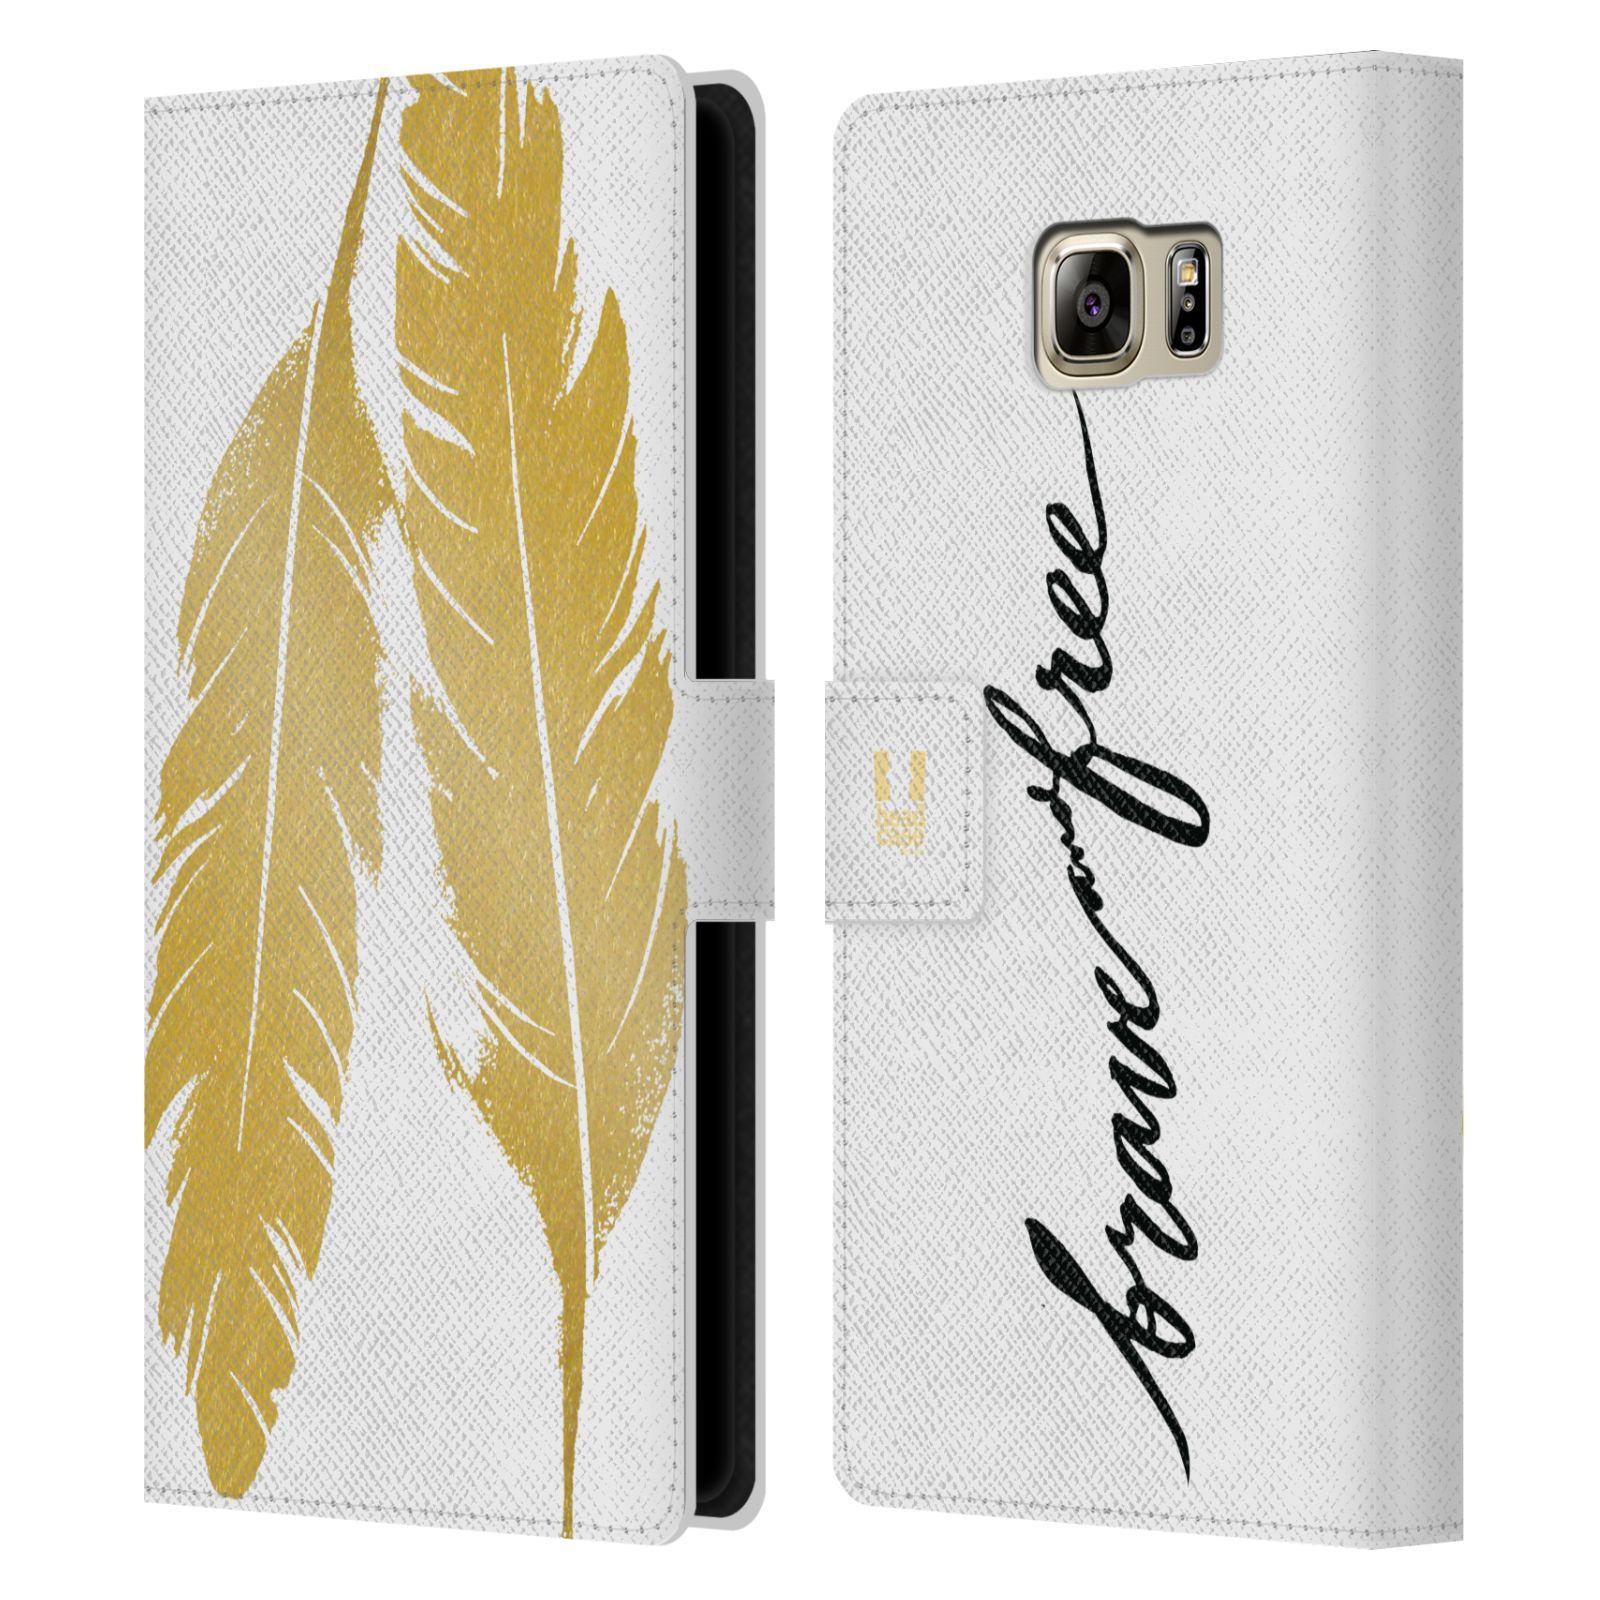 Pouzdro na mobil Samsung Galaxy NOTE 5 - Head Case - Fashion zlaté pírka